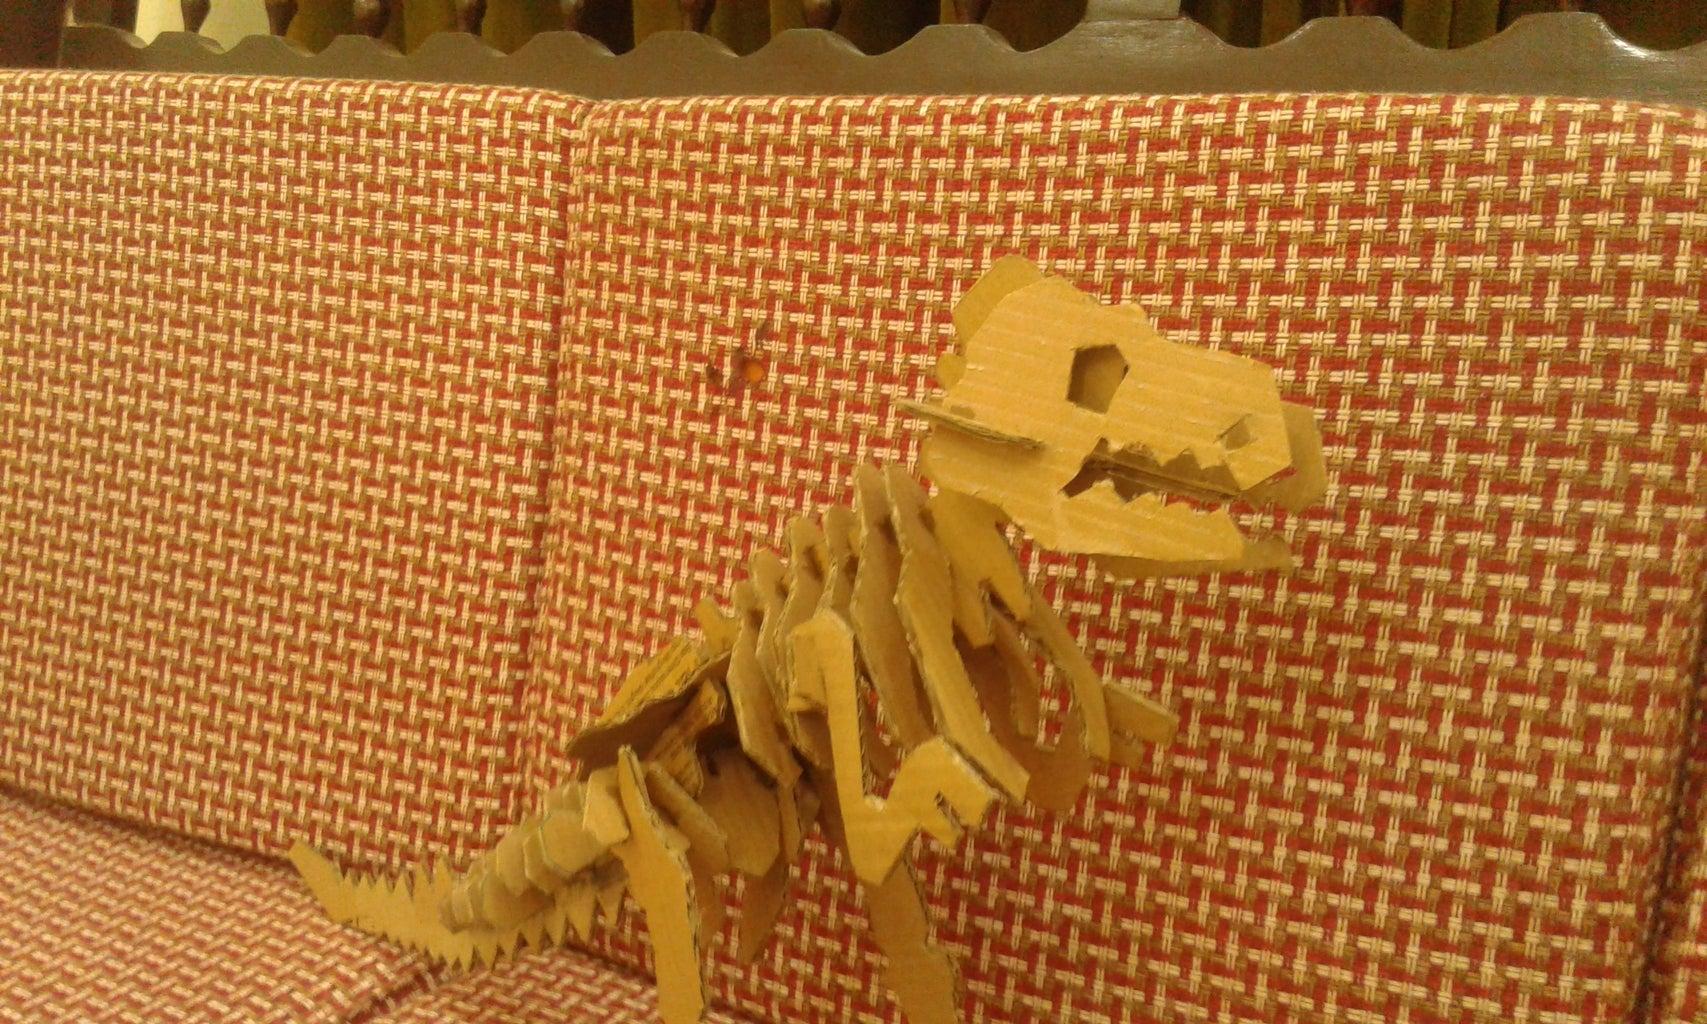 Cardboard TREX